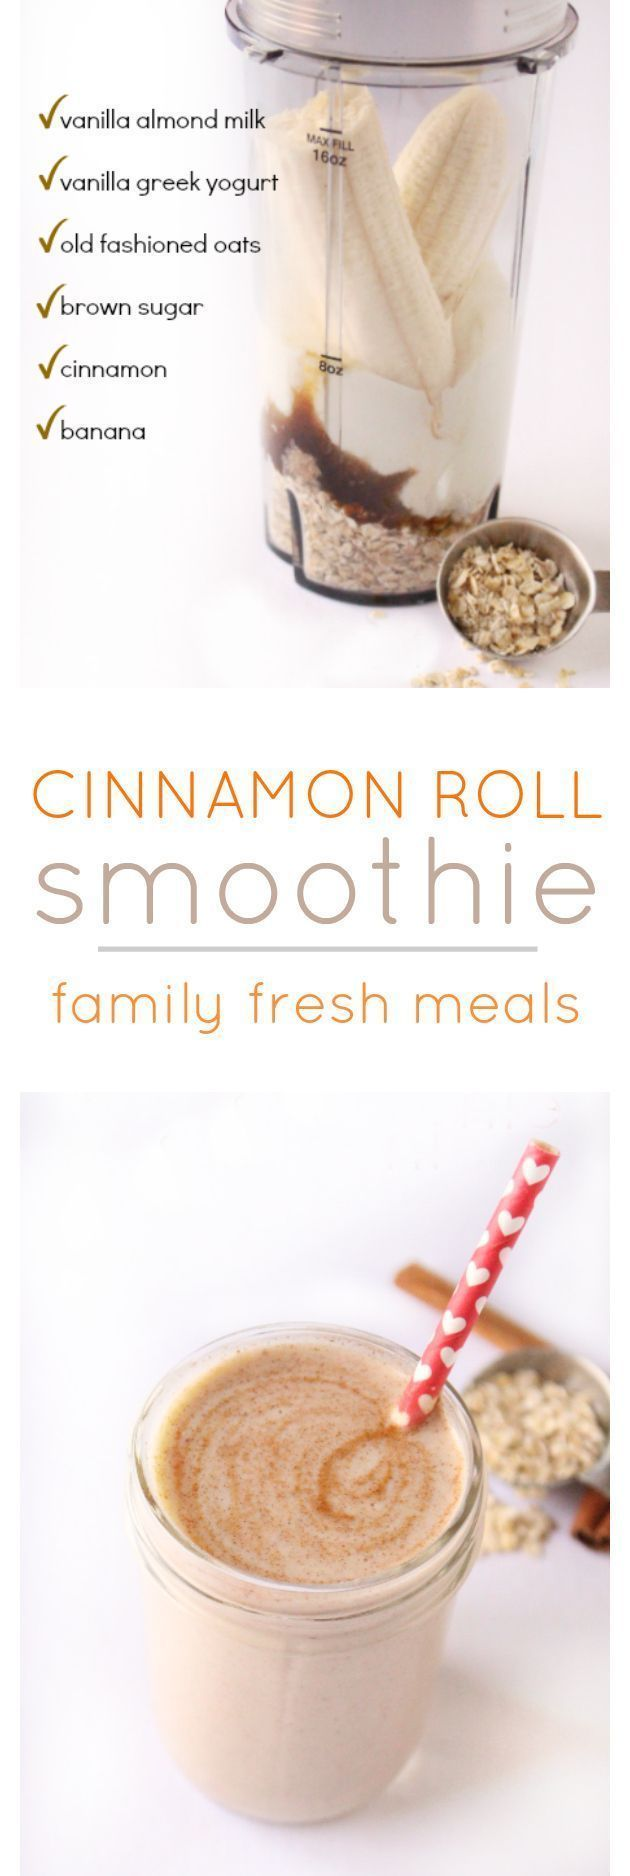 Cinnamon Roll Smoothie! Taste just like a cinnamon bun shoved into a glass.: